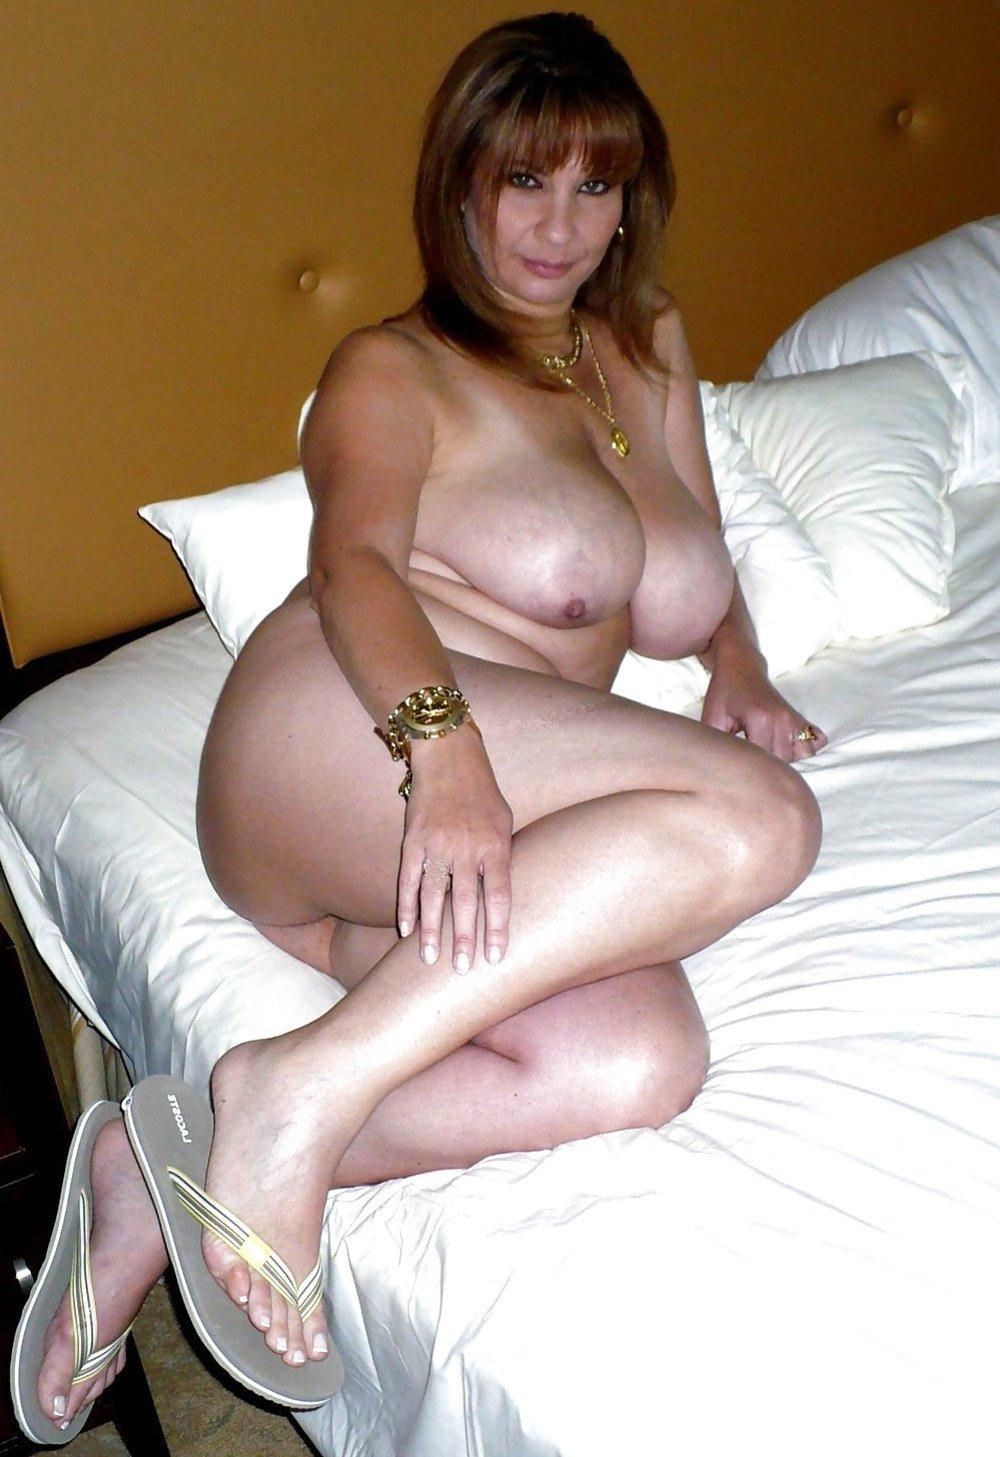 Sexy Puerto Rican Women Nude